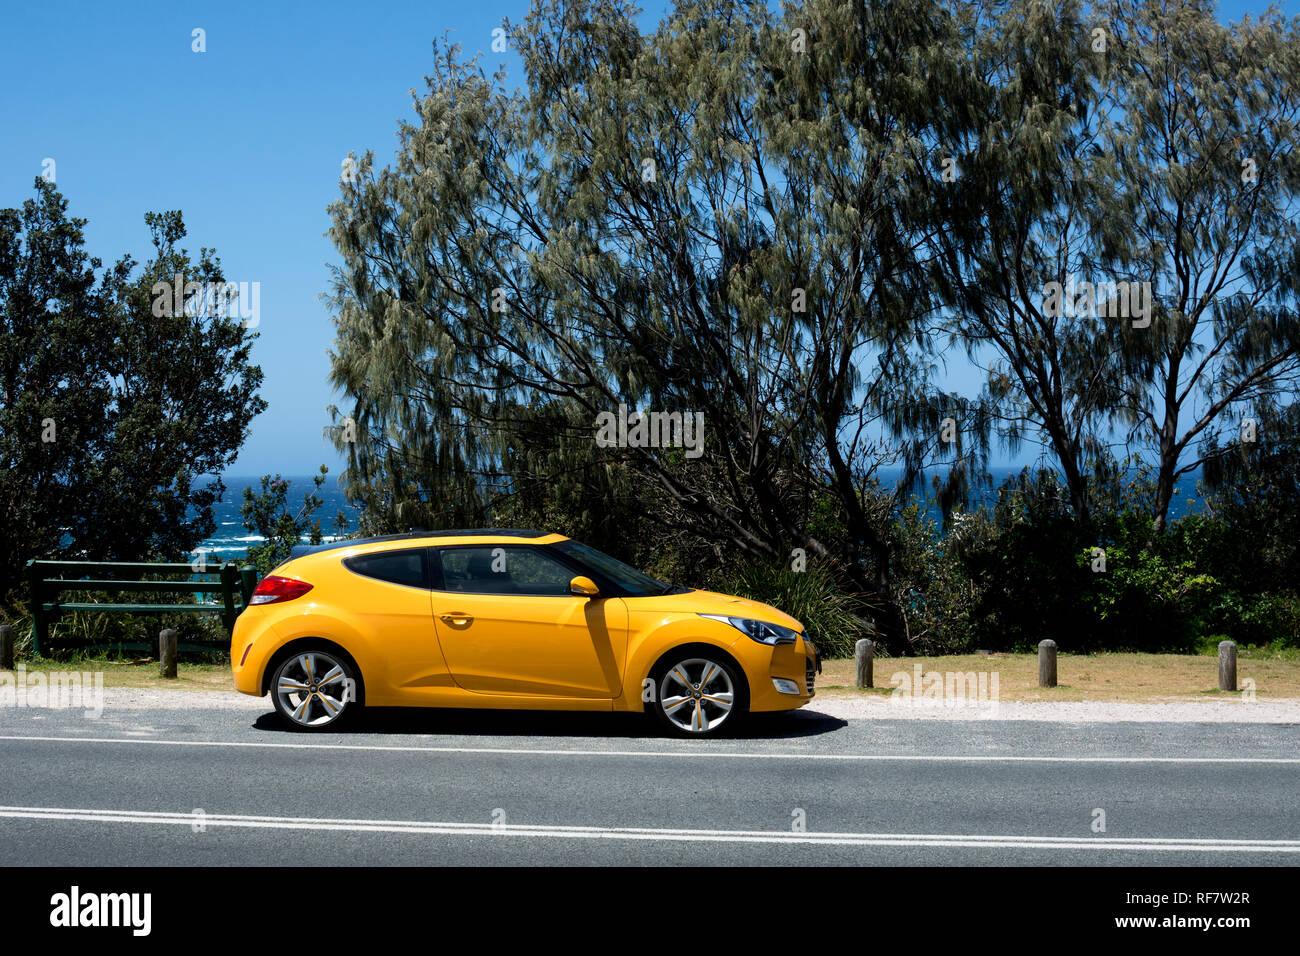 A Hyundai Veloster car, North Stradbroke Island, Queensland, Australia - Stock Image